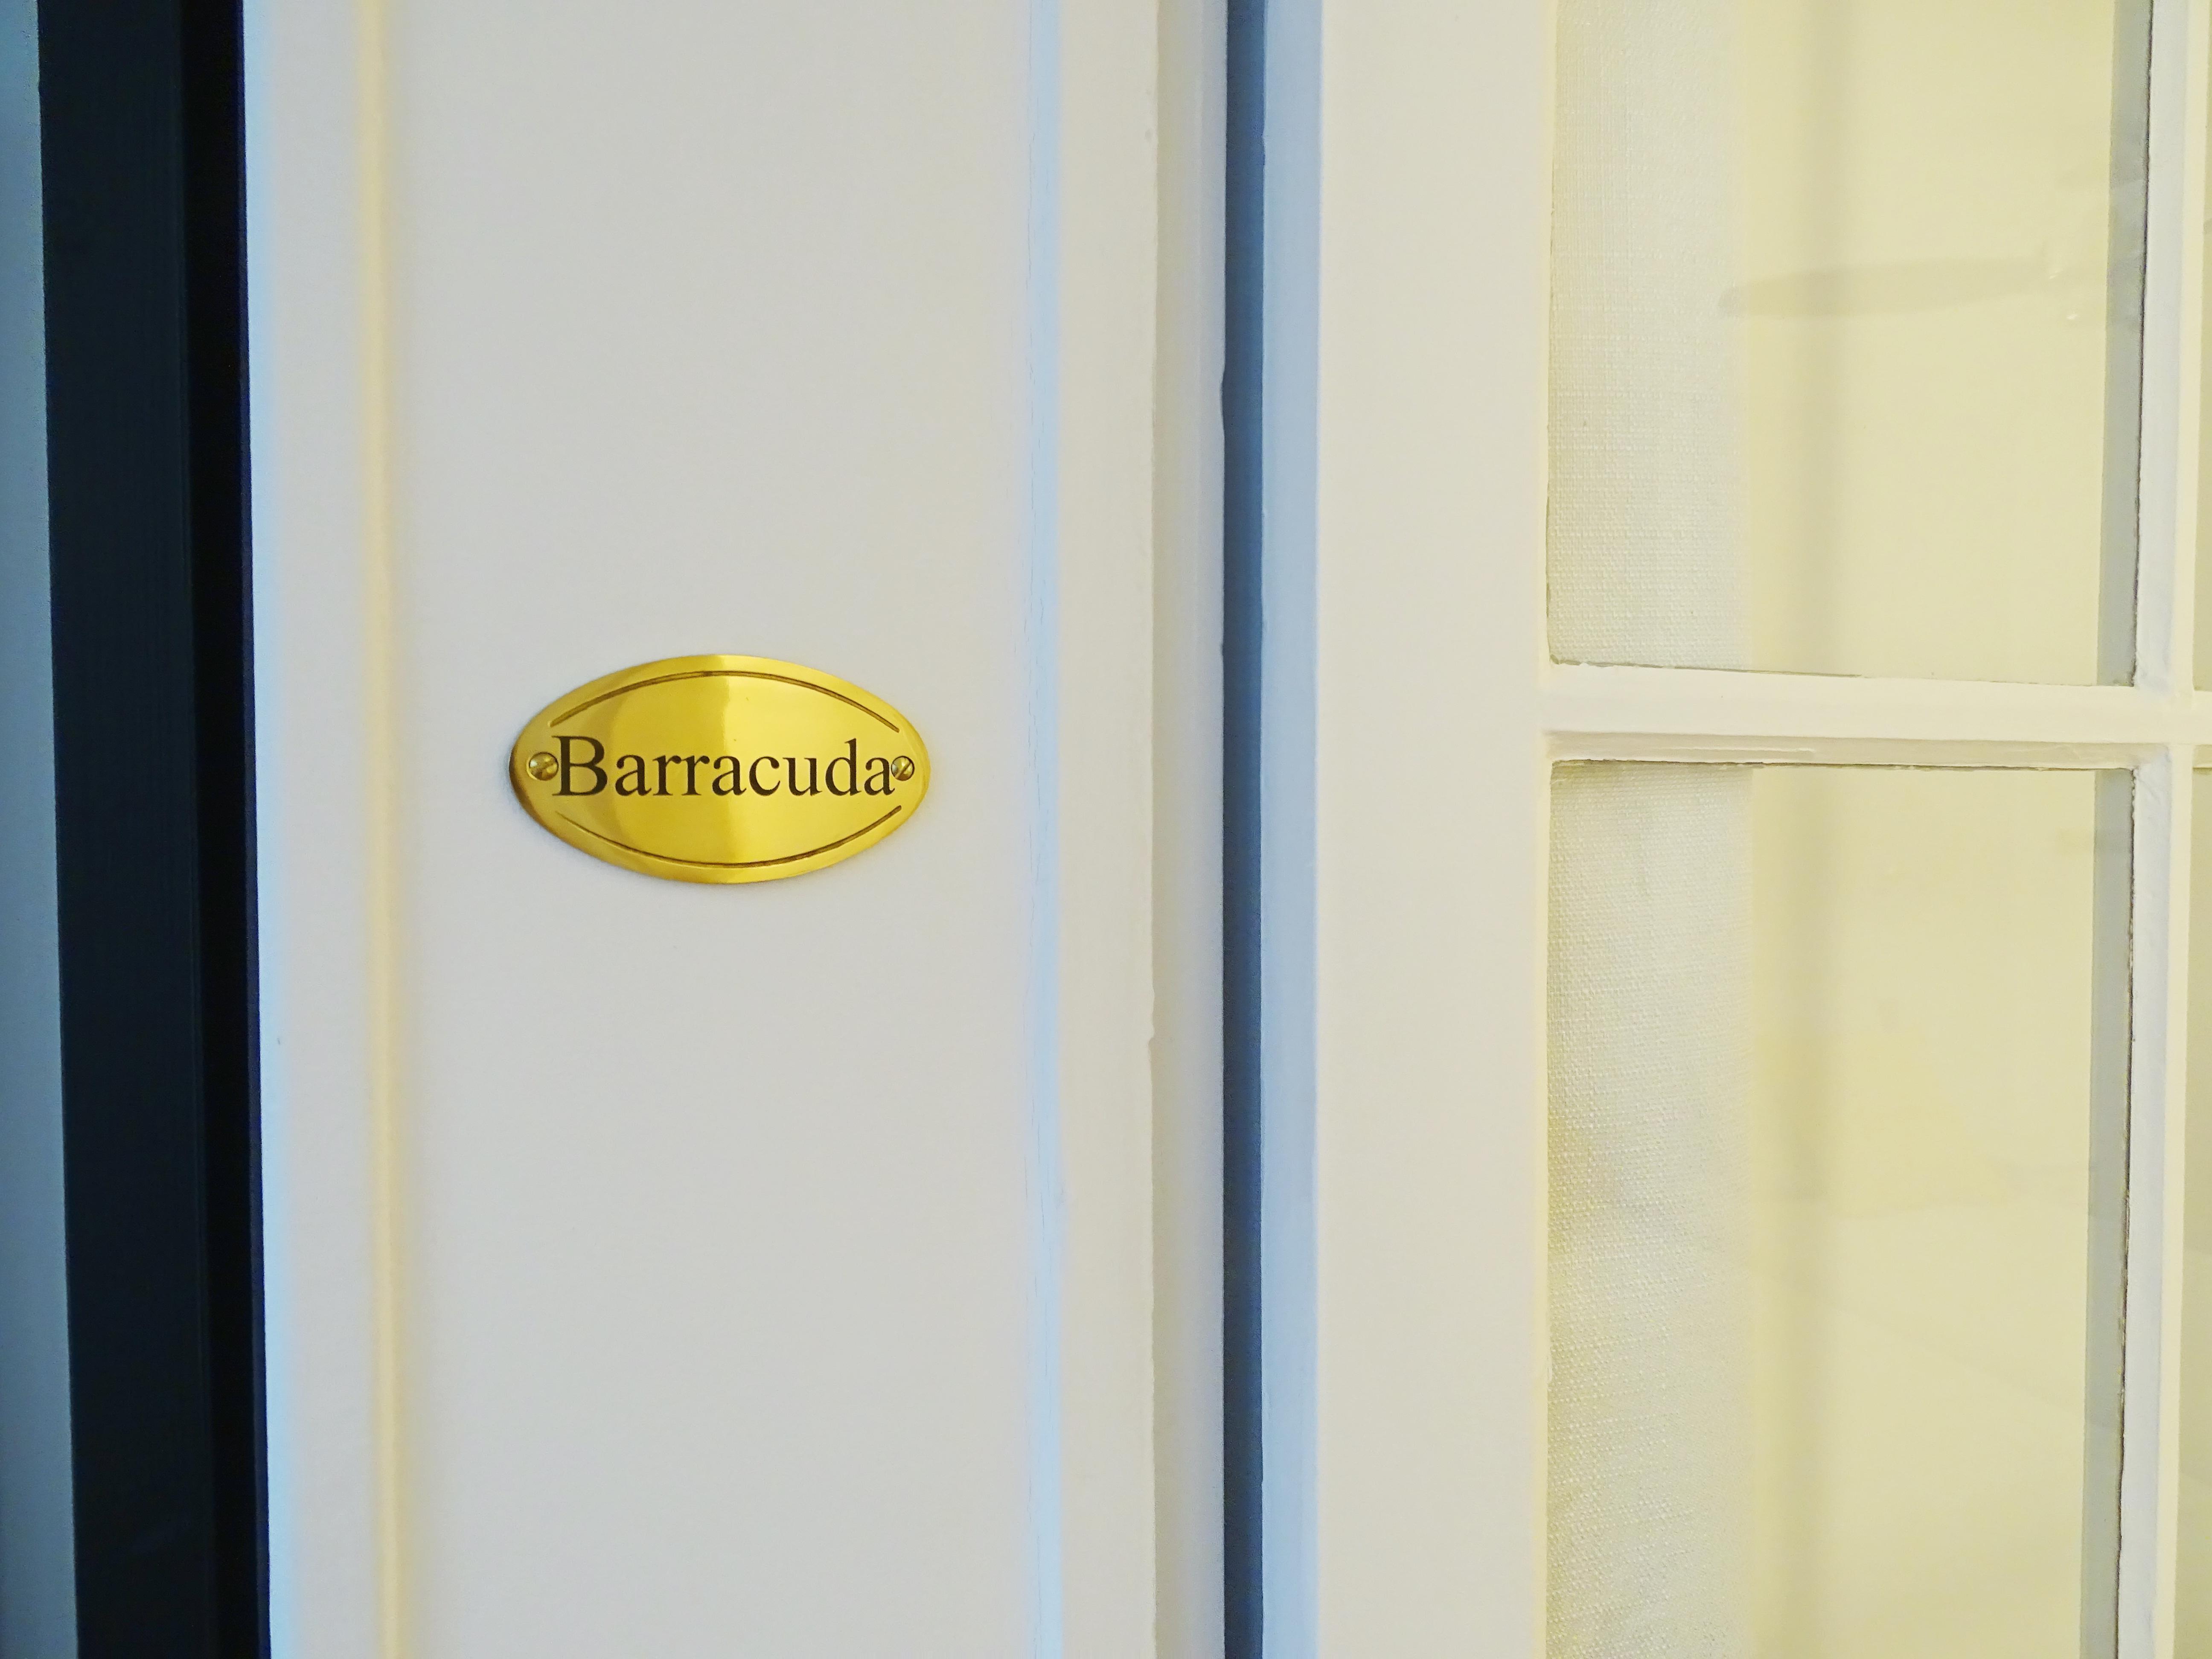 21-chambre barracuda 1